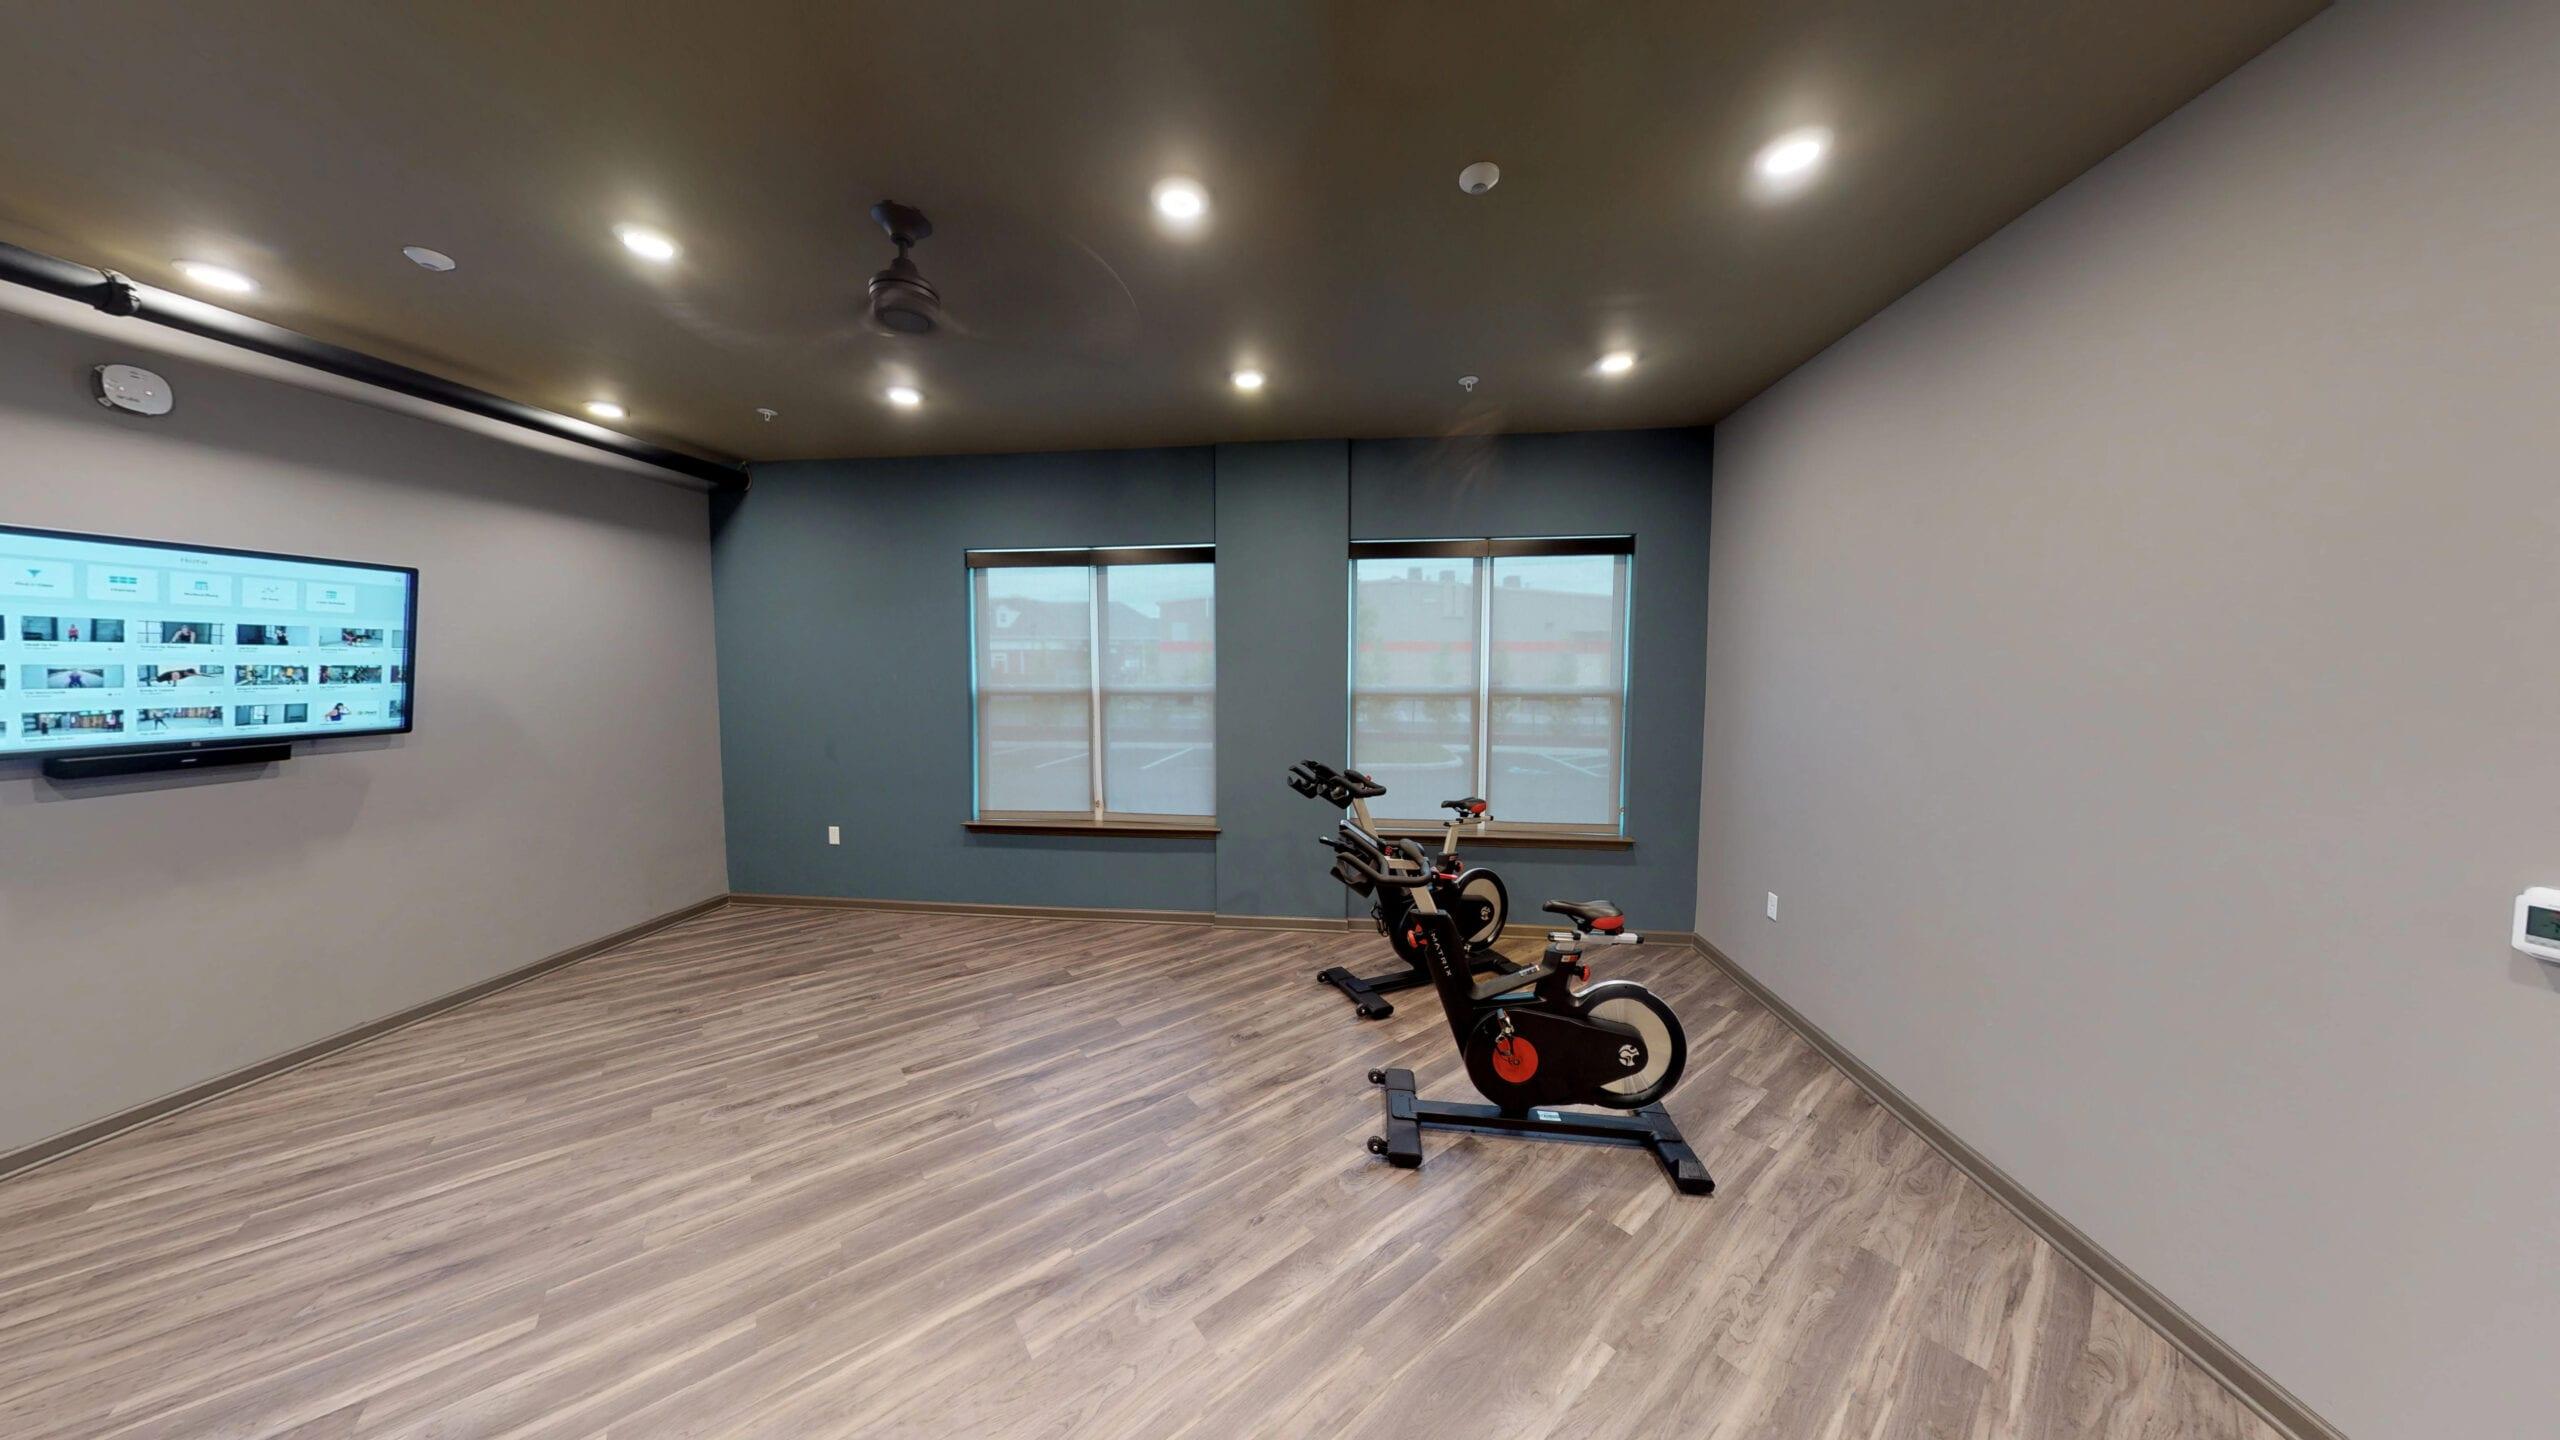 Yoga and Cardio Studio with On-Demand Fitness